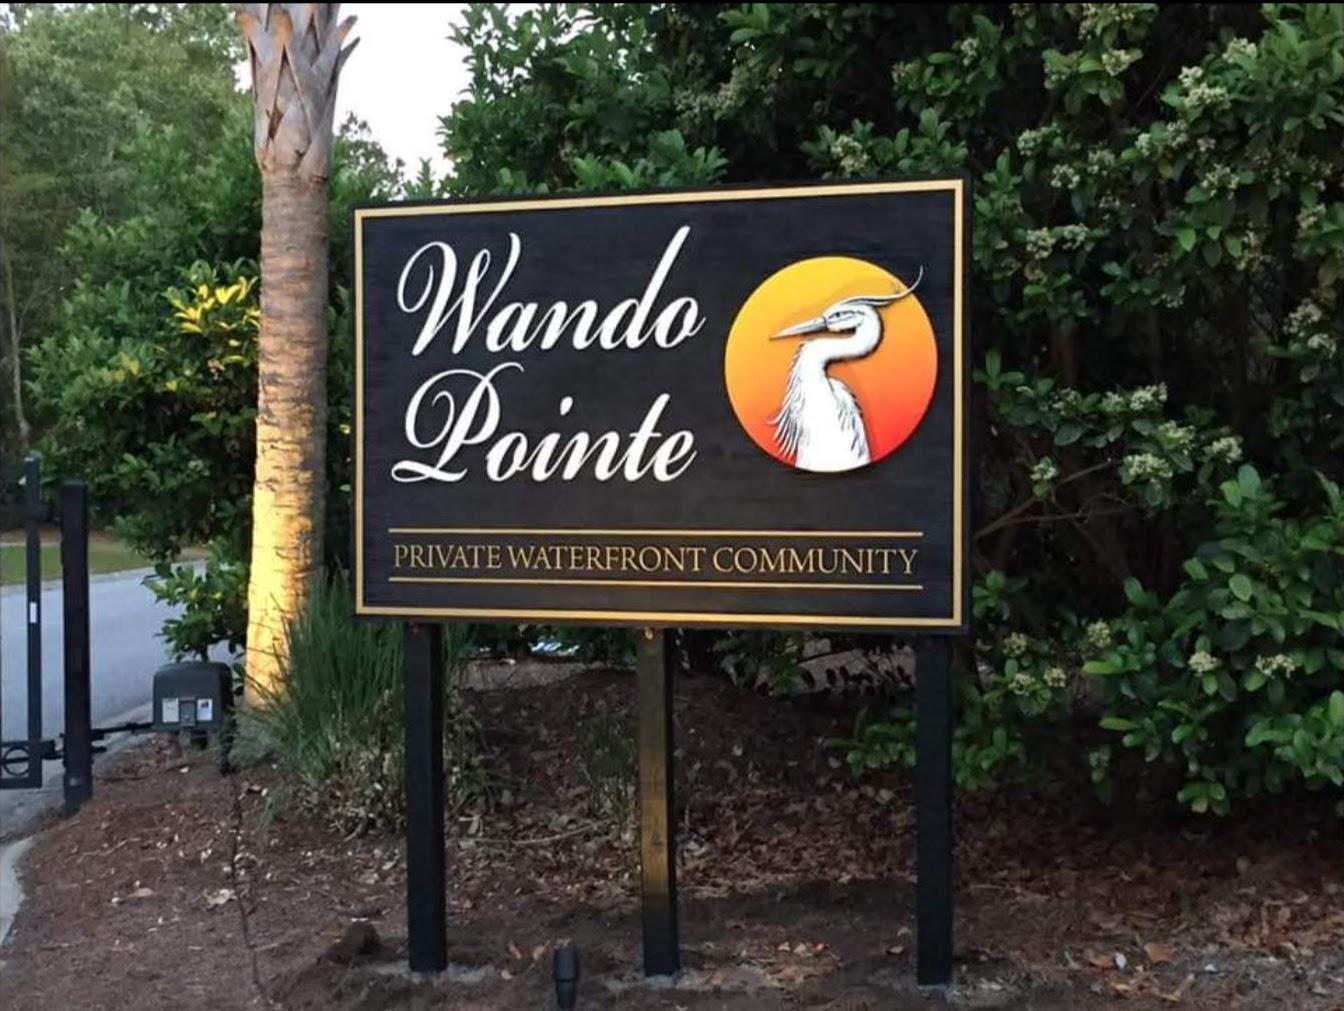 106 Wando Reach Road Wando, SC 29492